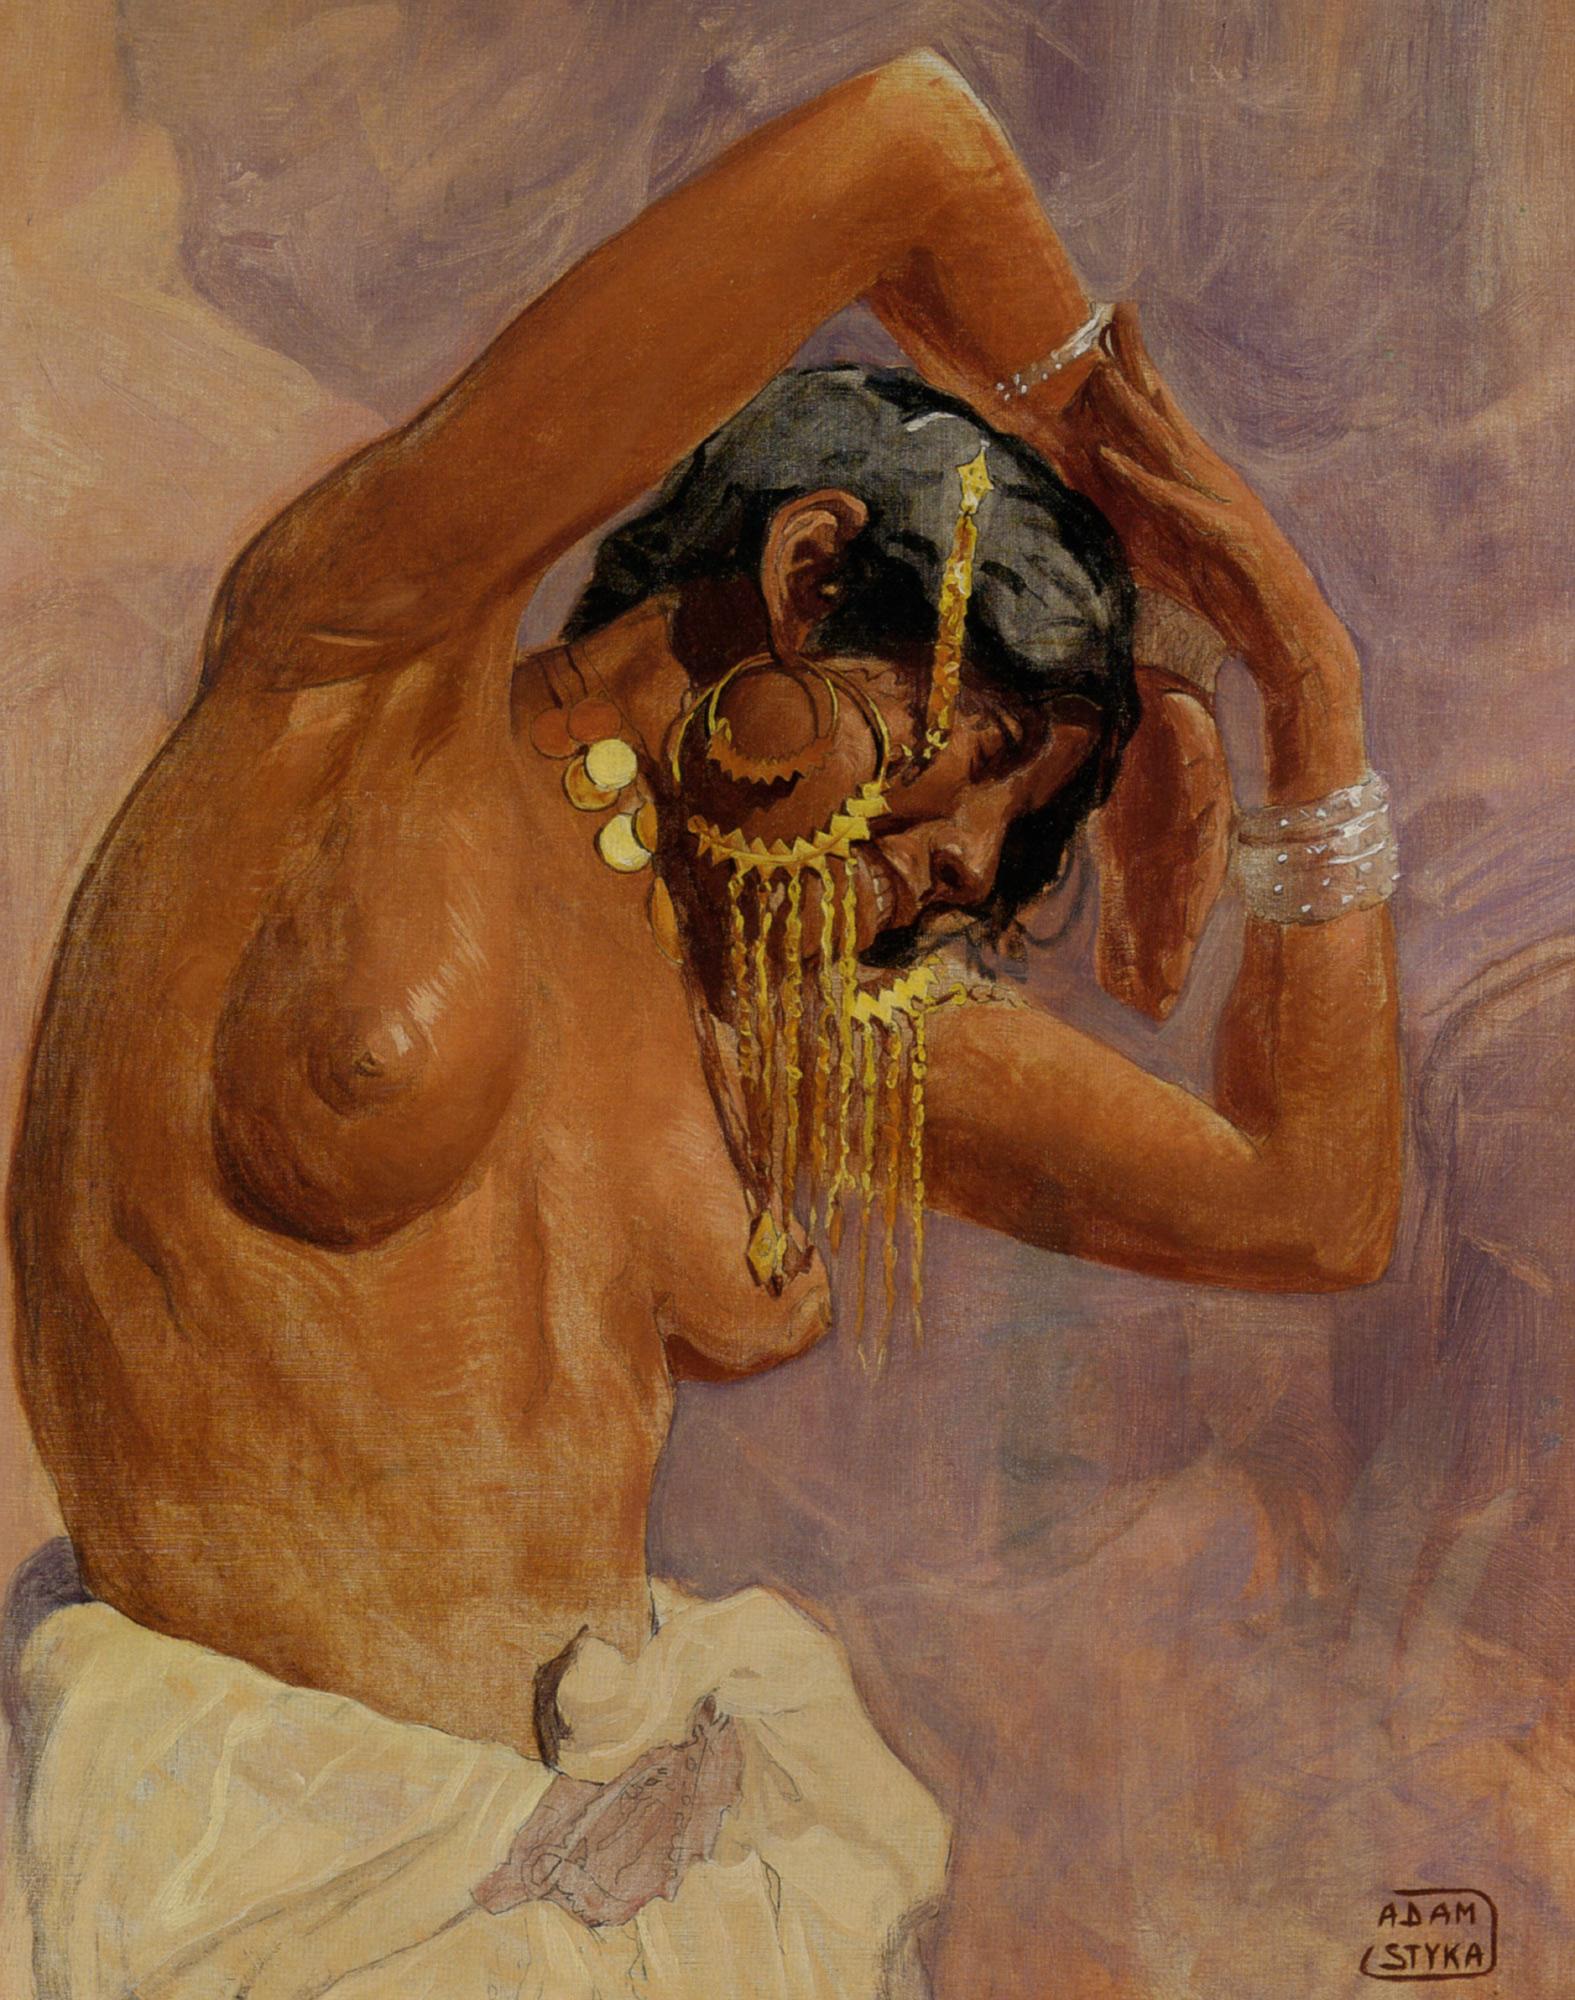 Harem Dancer :: Adam Styka - Arab women (Harem Life scenes) in art  and painting ôîòî